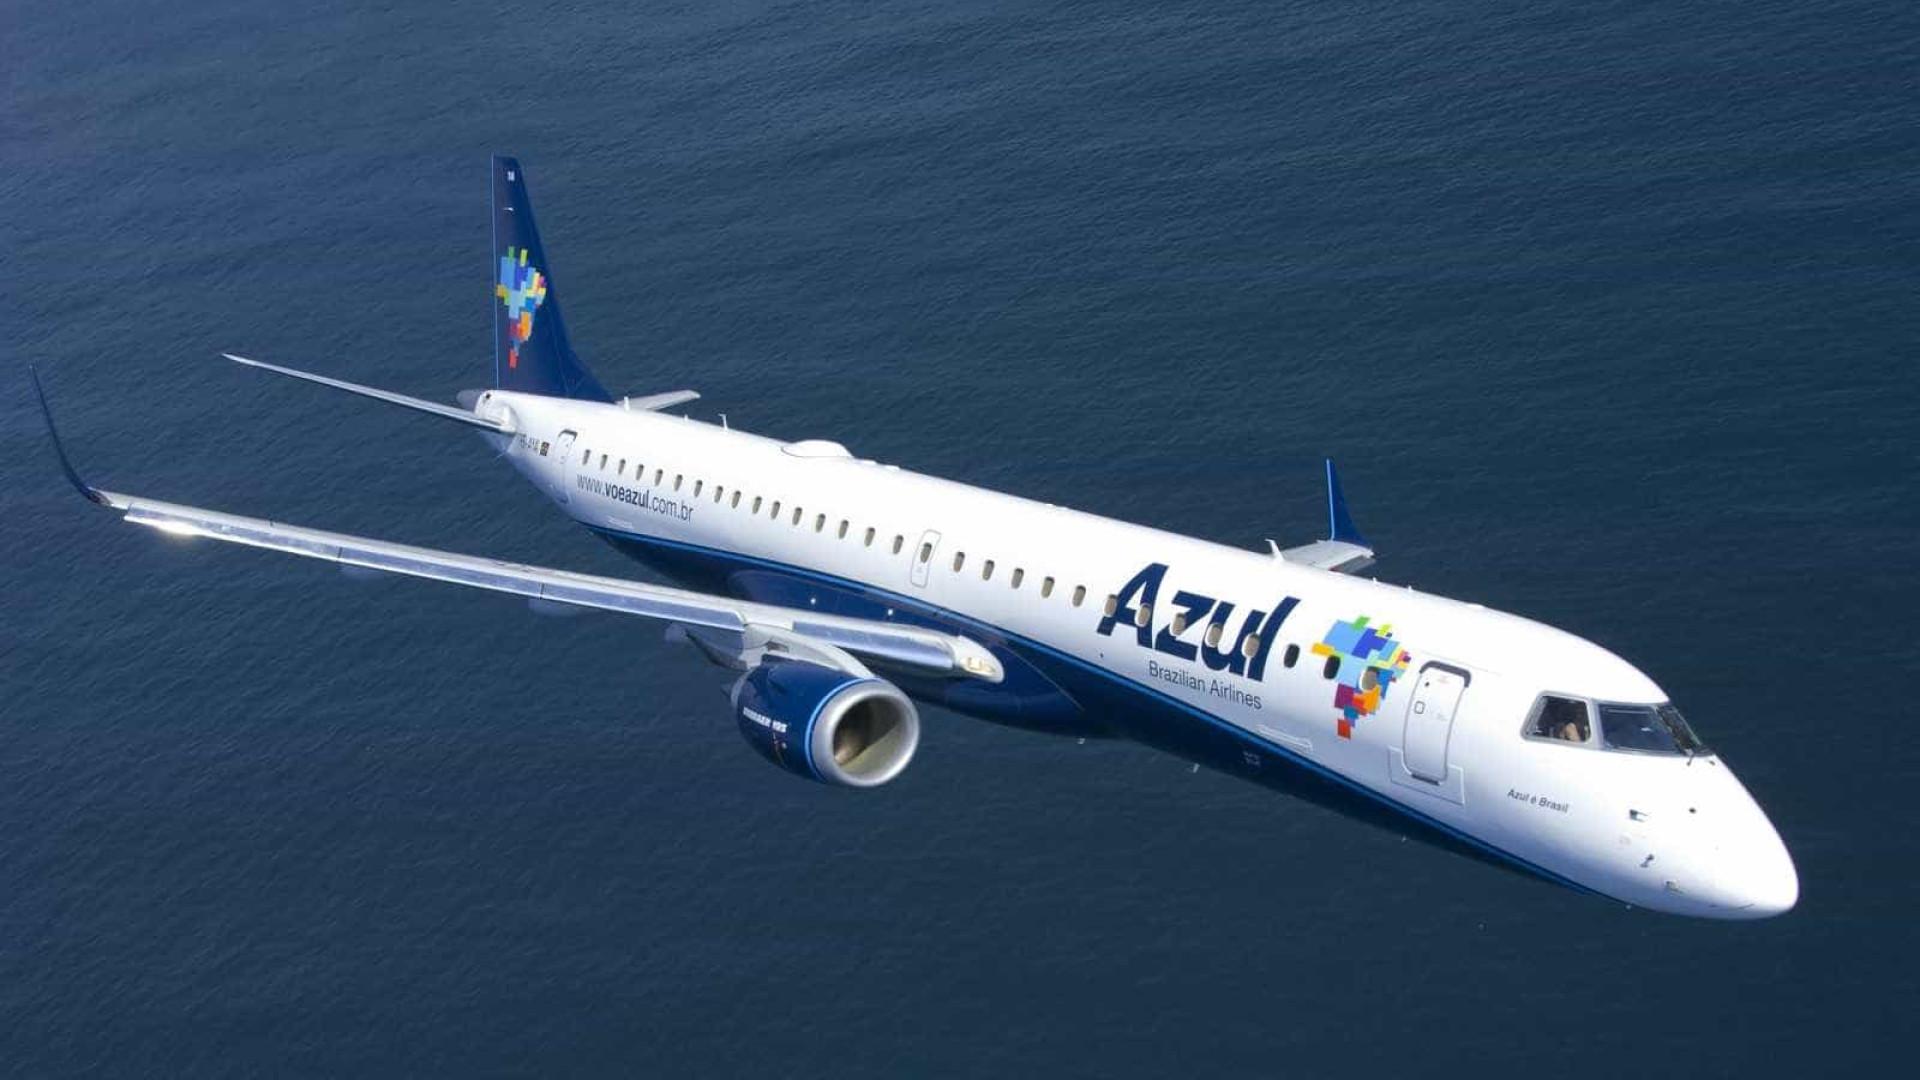 Azul terá de reavaliar proposta pela Avianca, diz analista